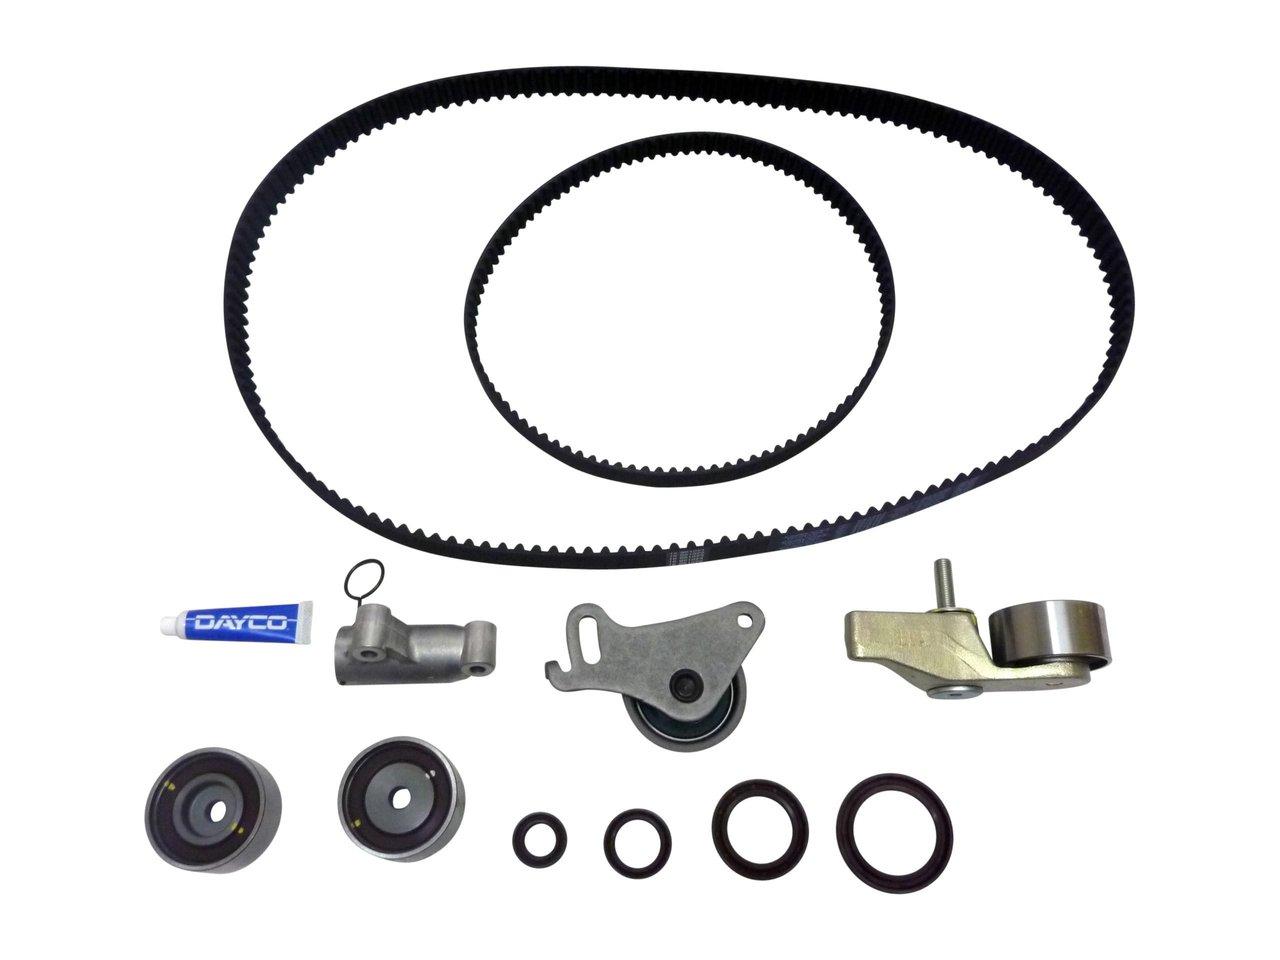 Timing Belt Kit For Mitsubishi Triton Challenger 25 Turbo Diesel 1999 Isuzu Rodeo 2 Suitable Dayco Ktba281h